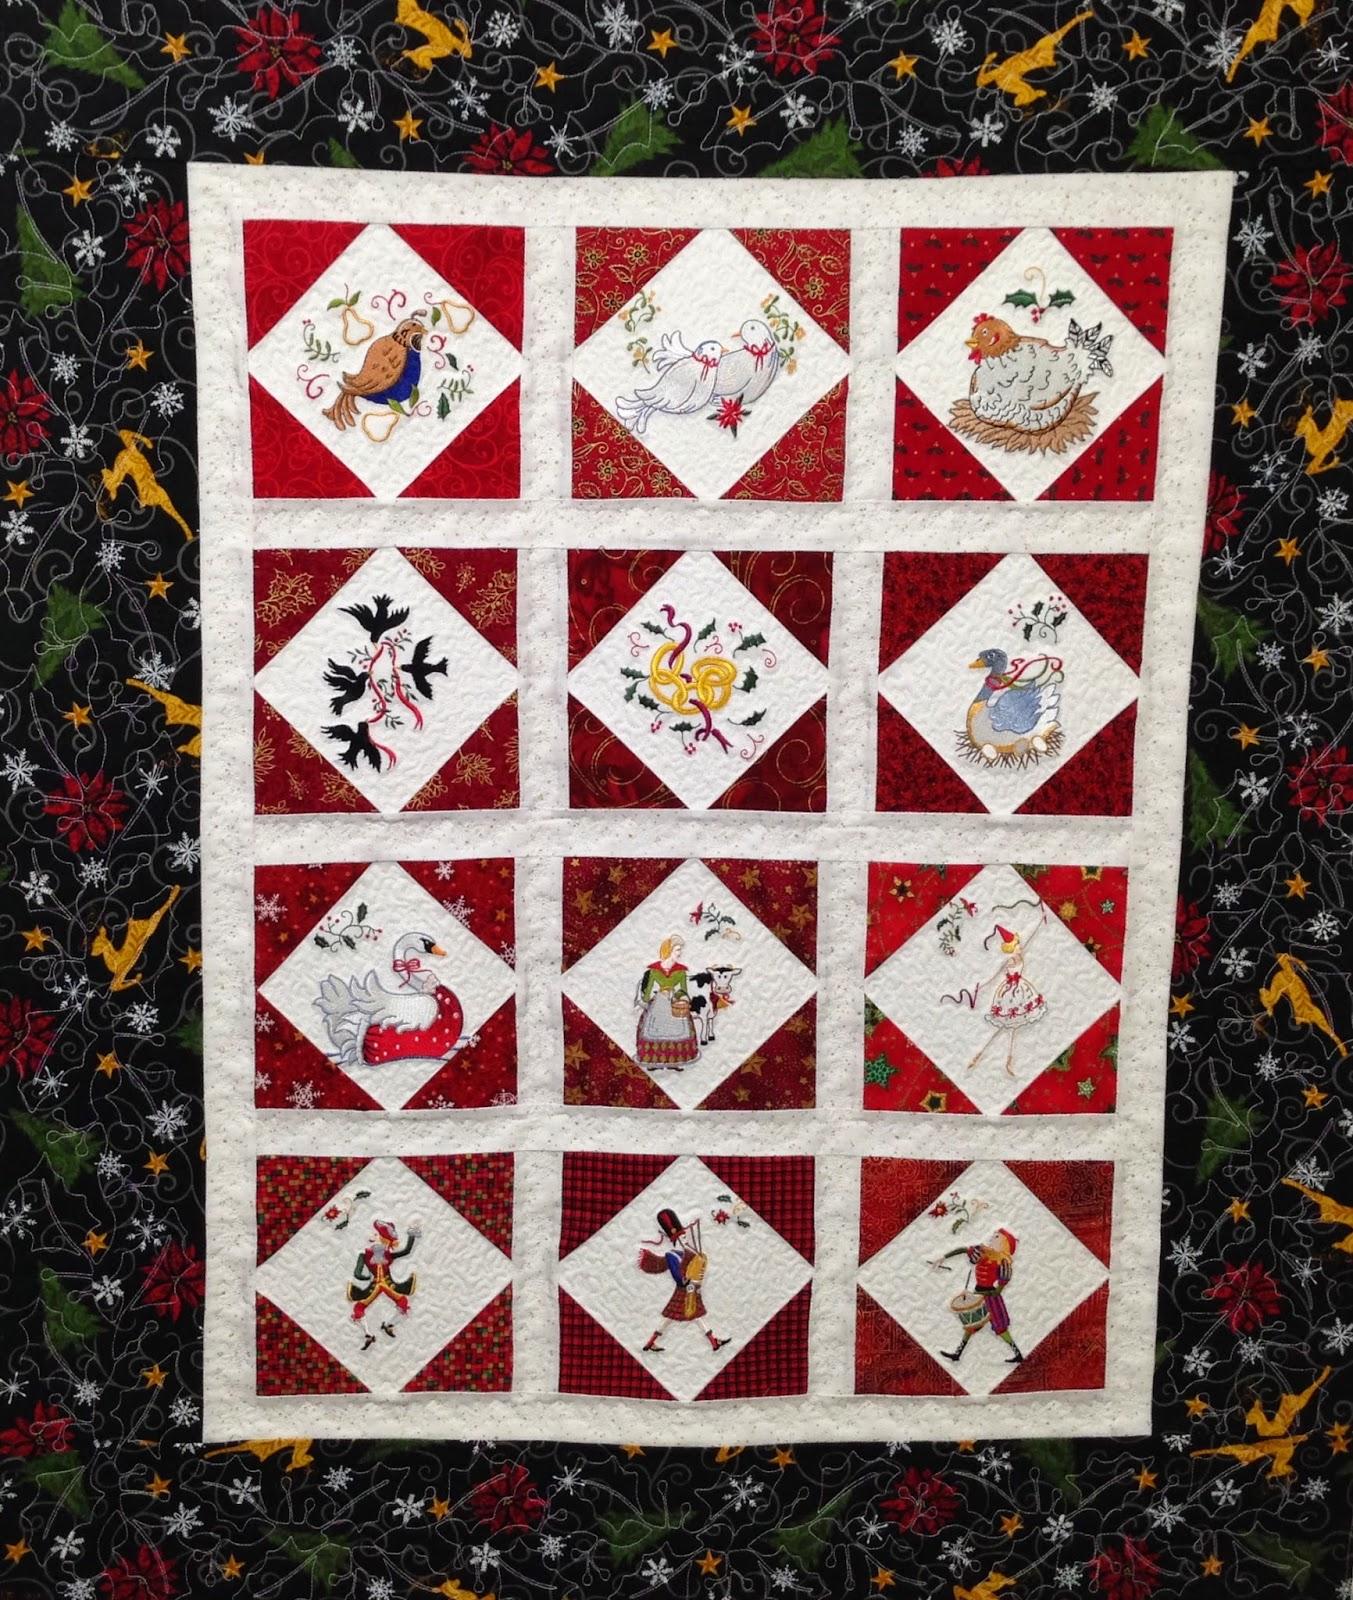 Cheryl Vastola's 12 Days of Christmas Quilt